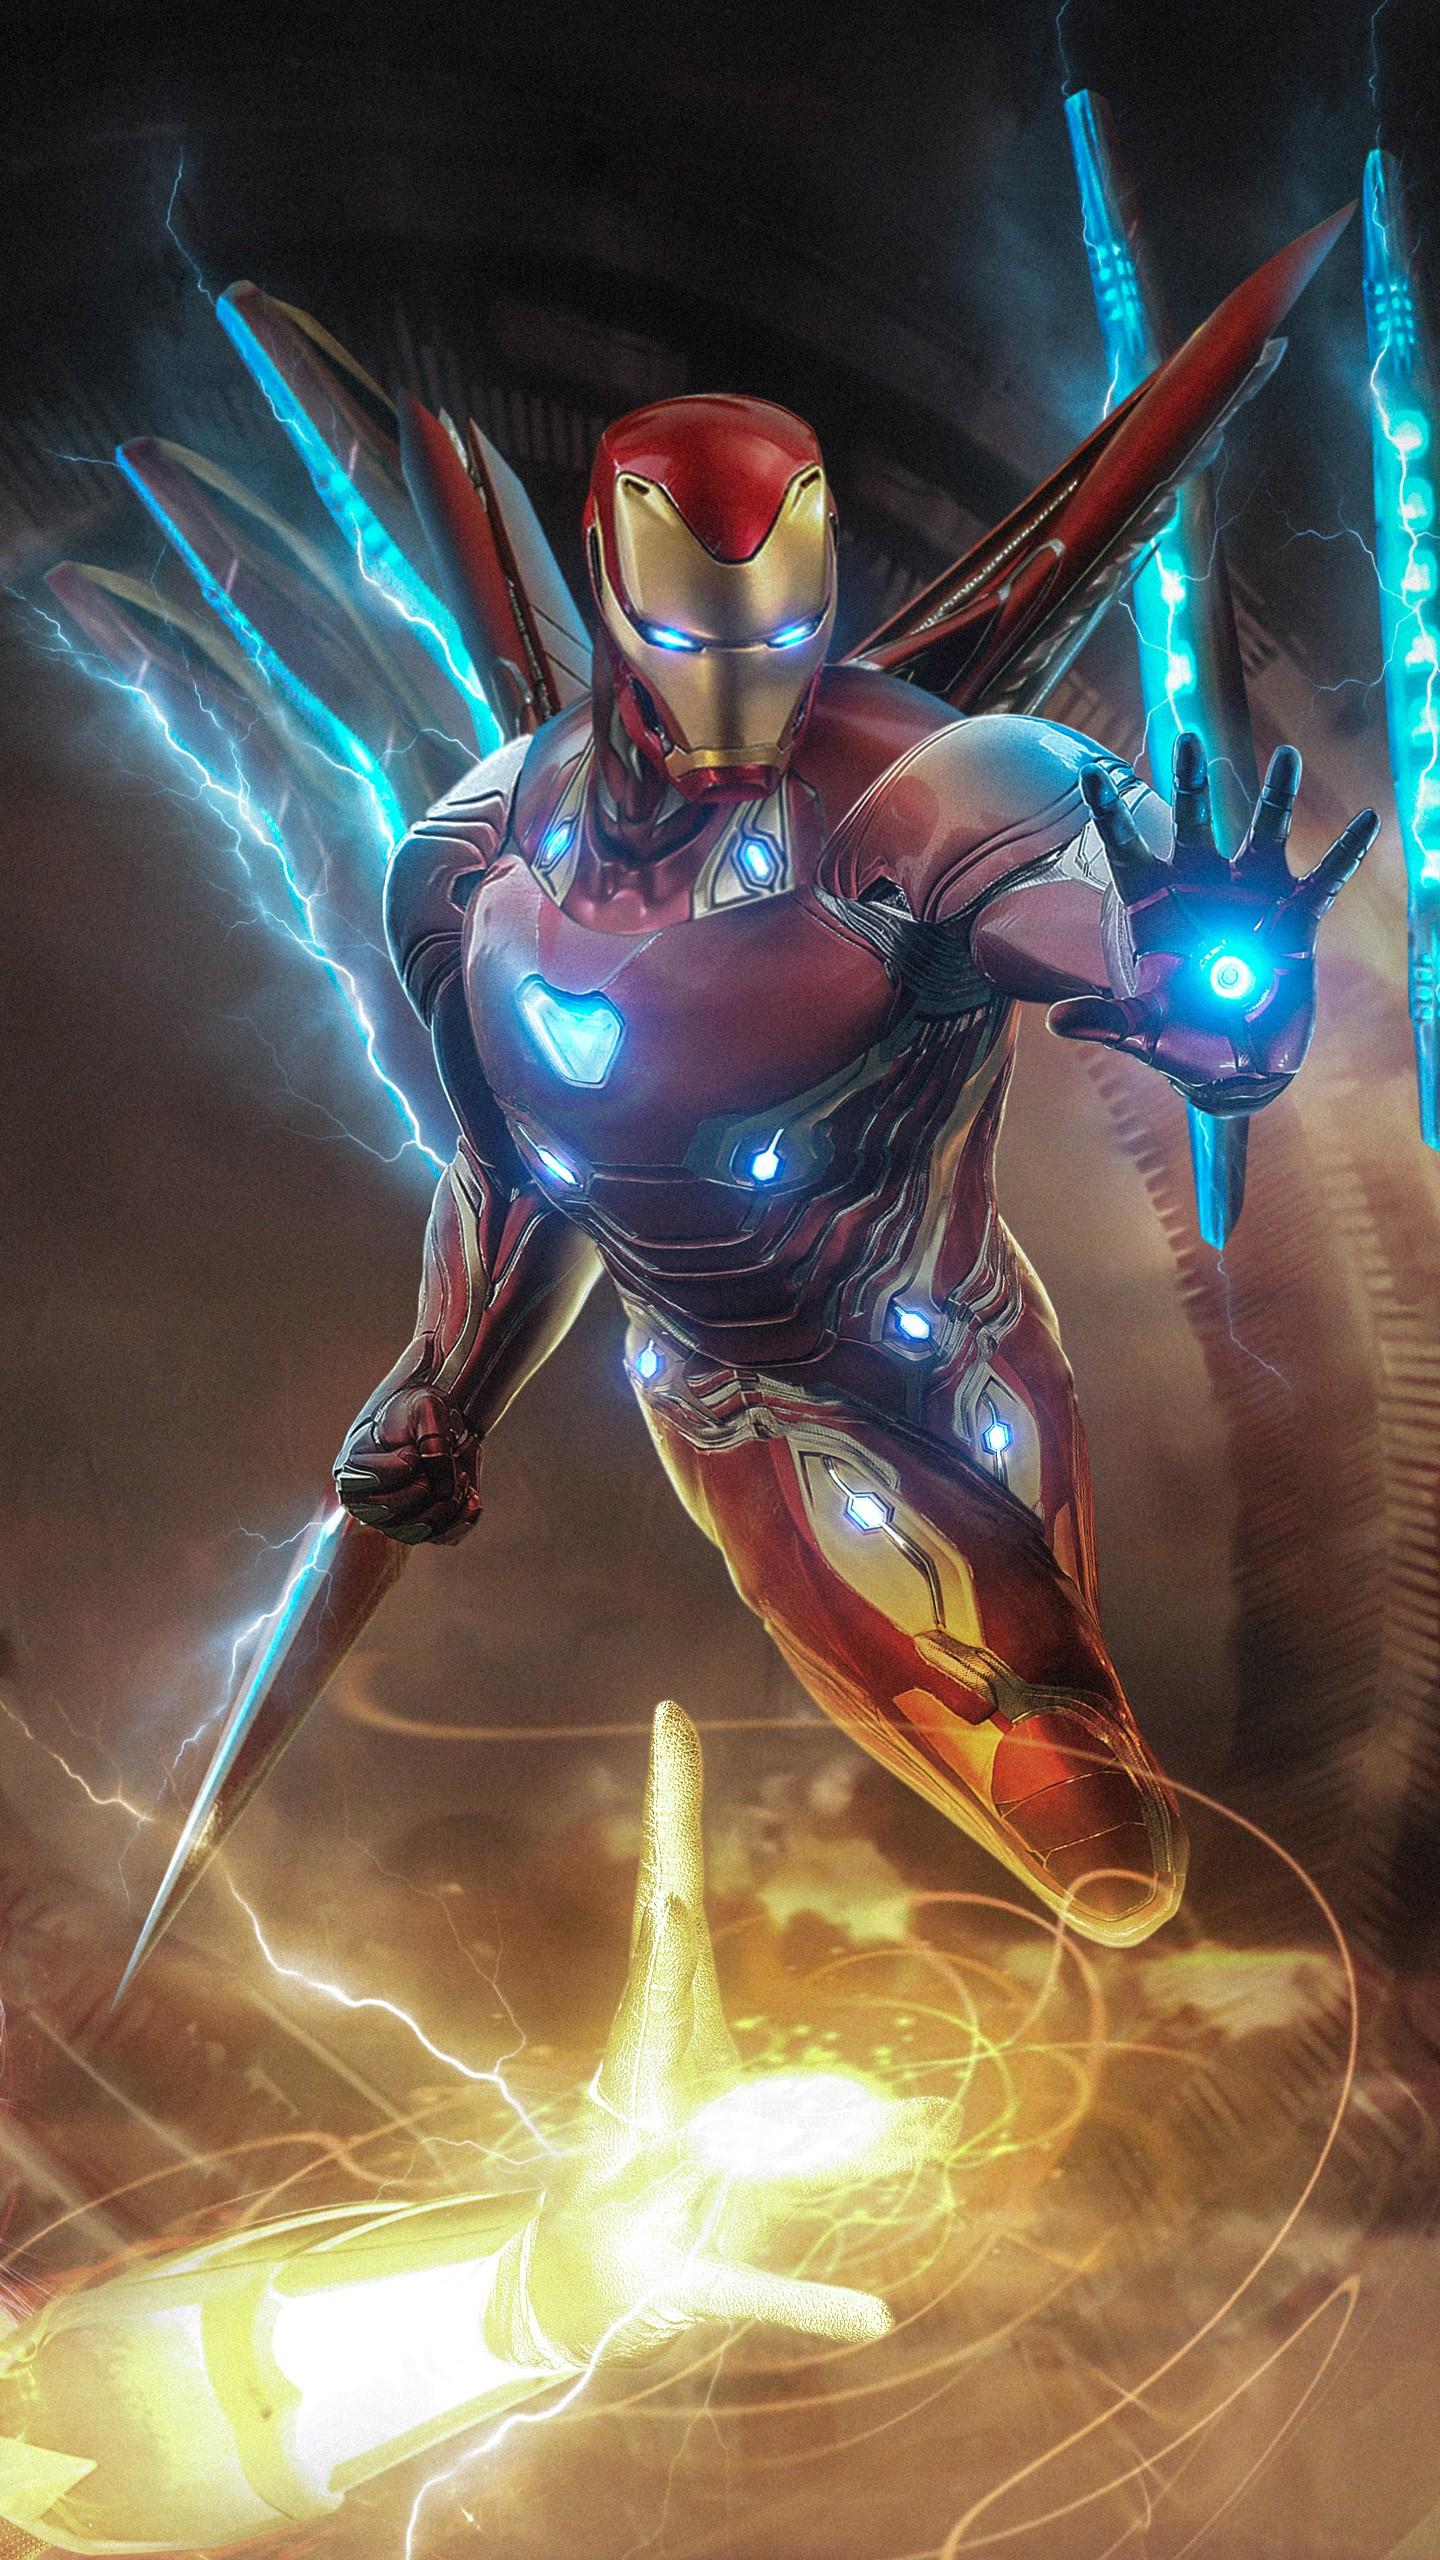 Iron Man Infinity War Hd Iphone Hd Wallpapers Wallpaper Cave